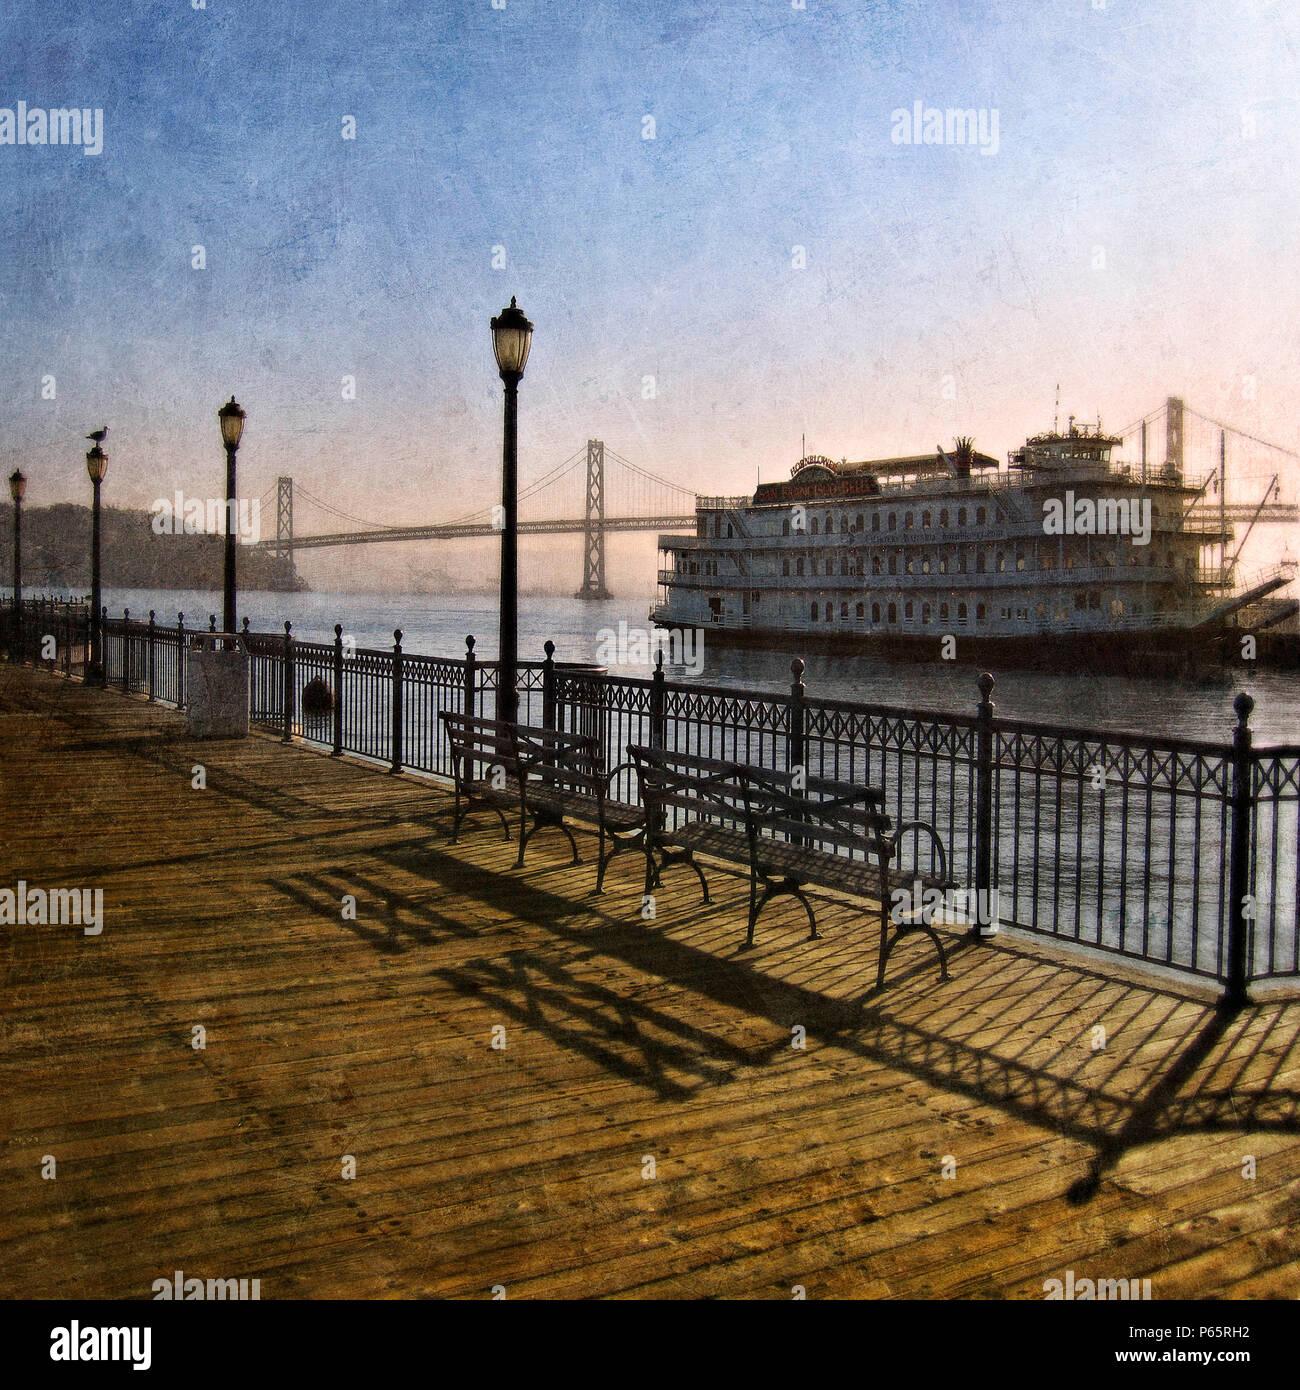 Promenade and Cruiser and San Francisco-Oakland Bay Bridge, San Francisco Bay, California, USA (painterly) - Stock Image